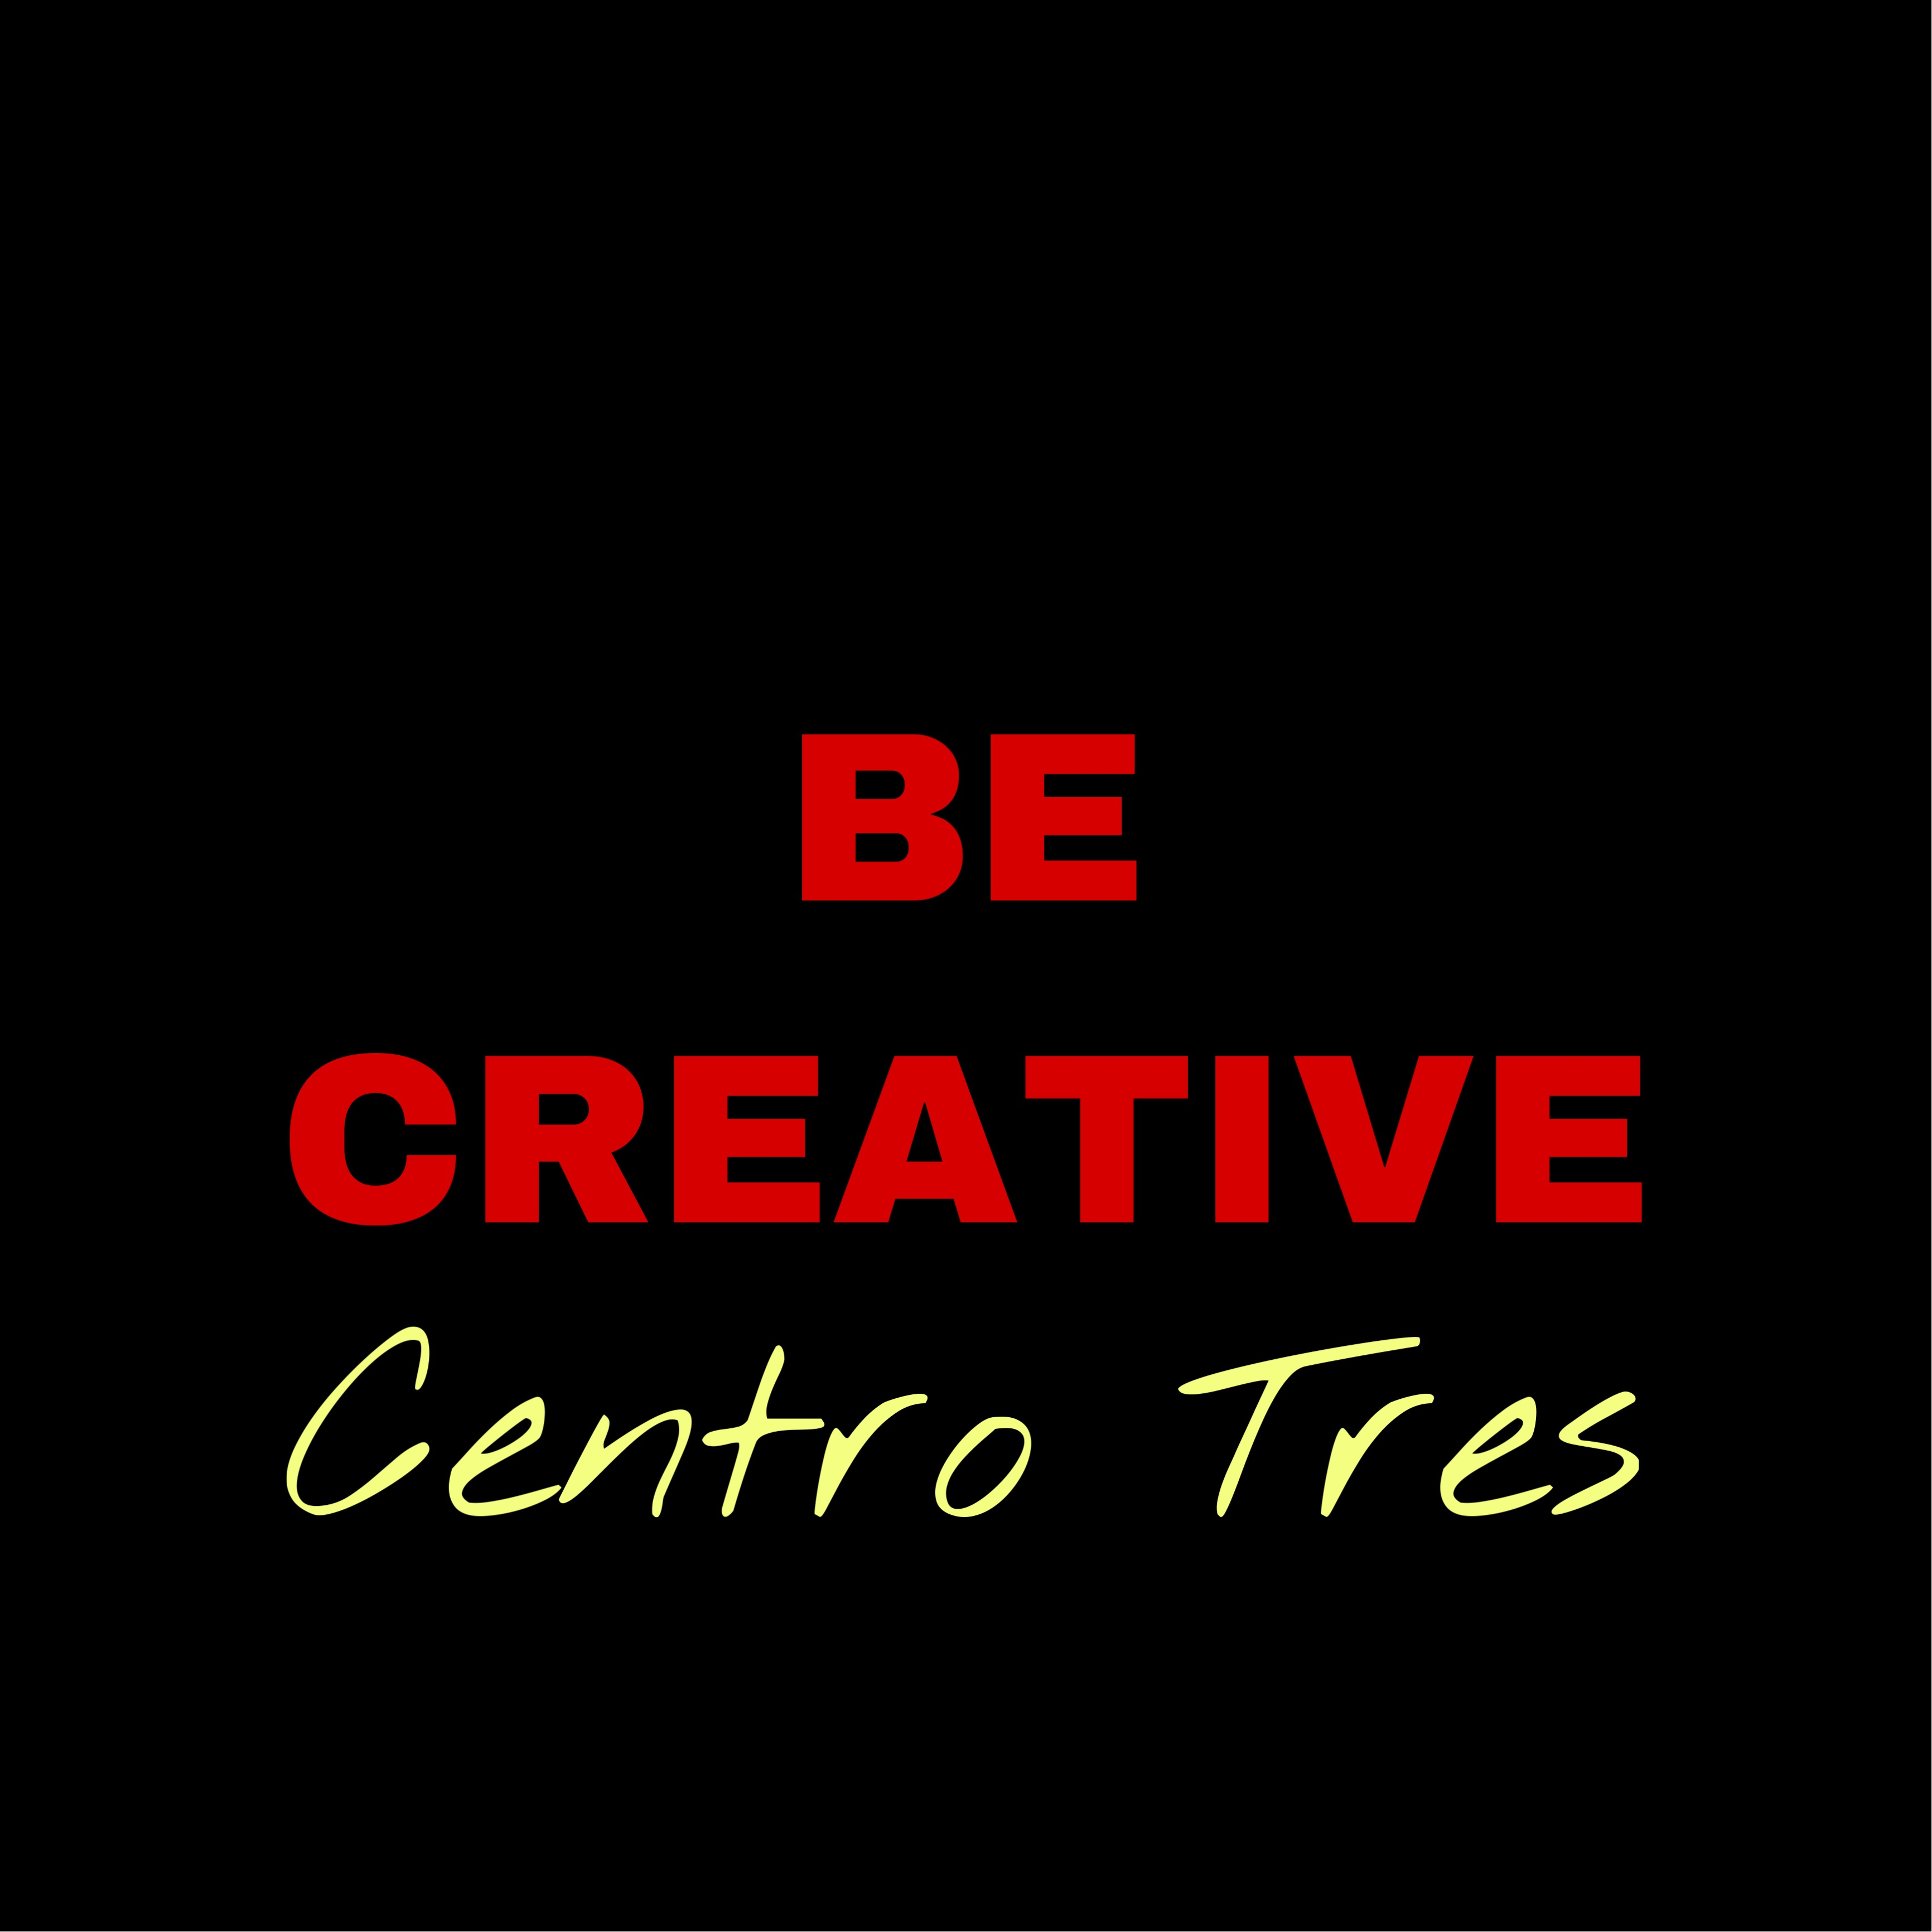 be creative centro tres